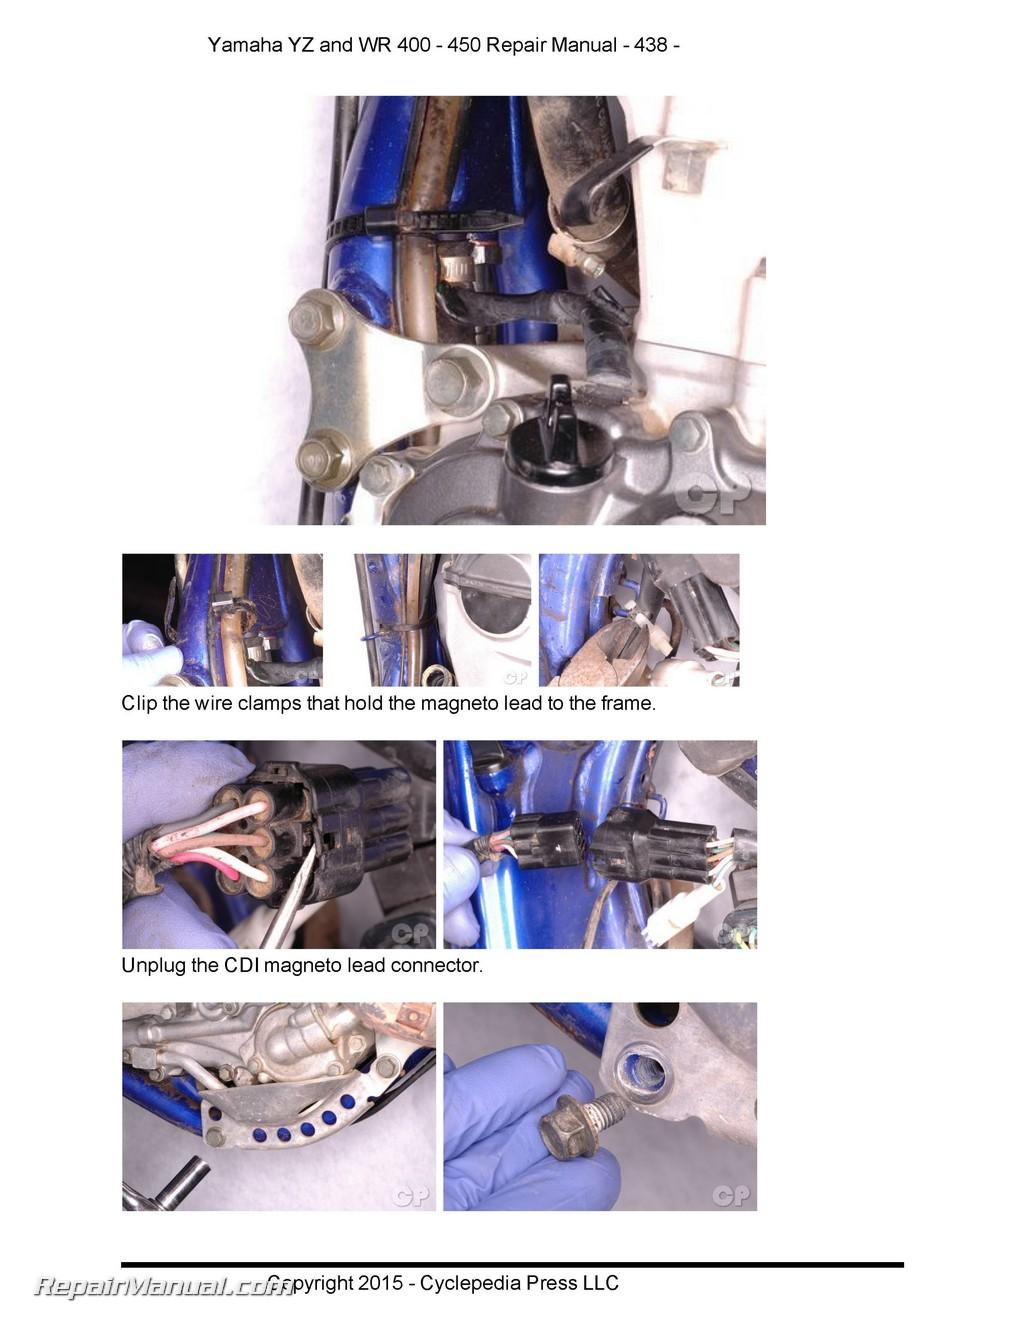 hight resolution of  array yamaha yz wr 400 426 450f cyclepedia printed motorcycle service manual rh repairmanual